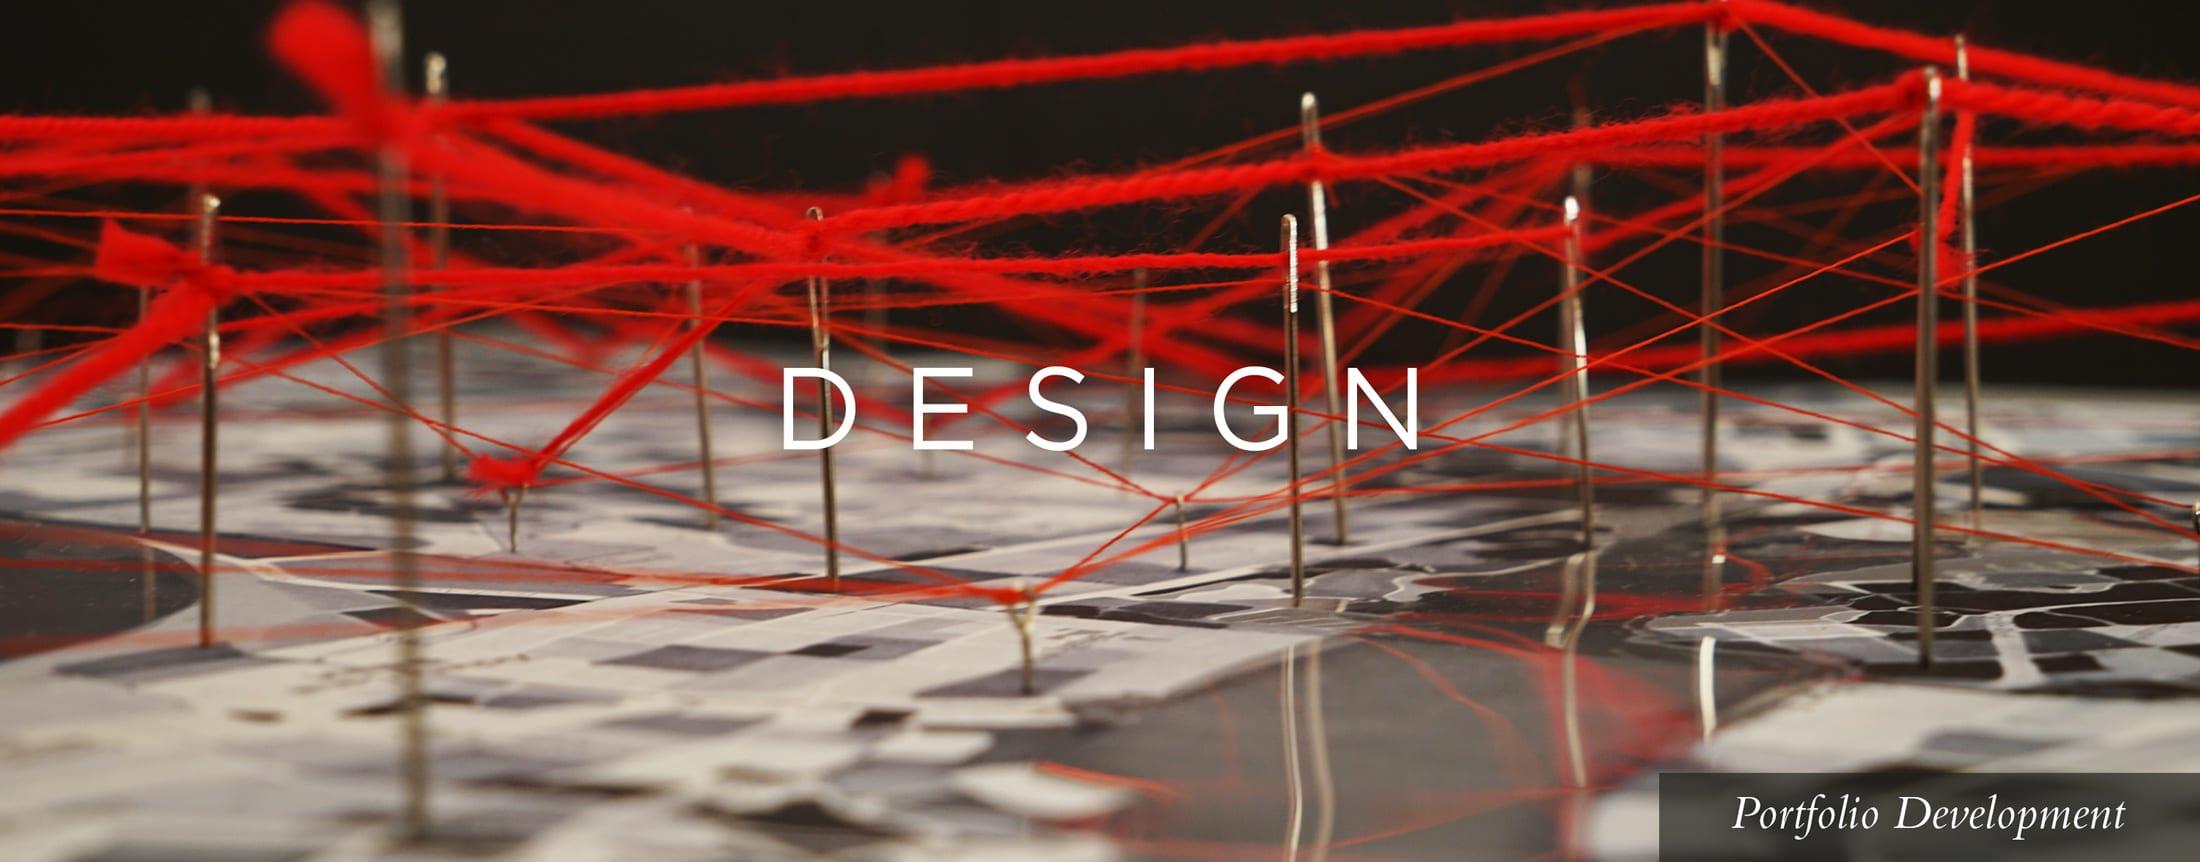 Slider 1 – Design